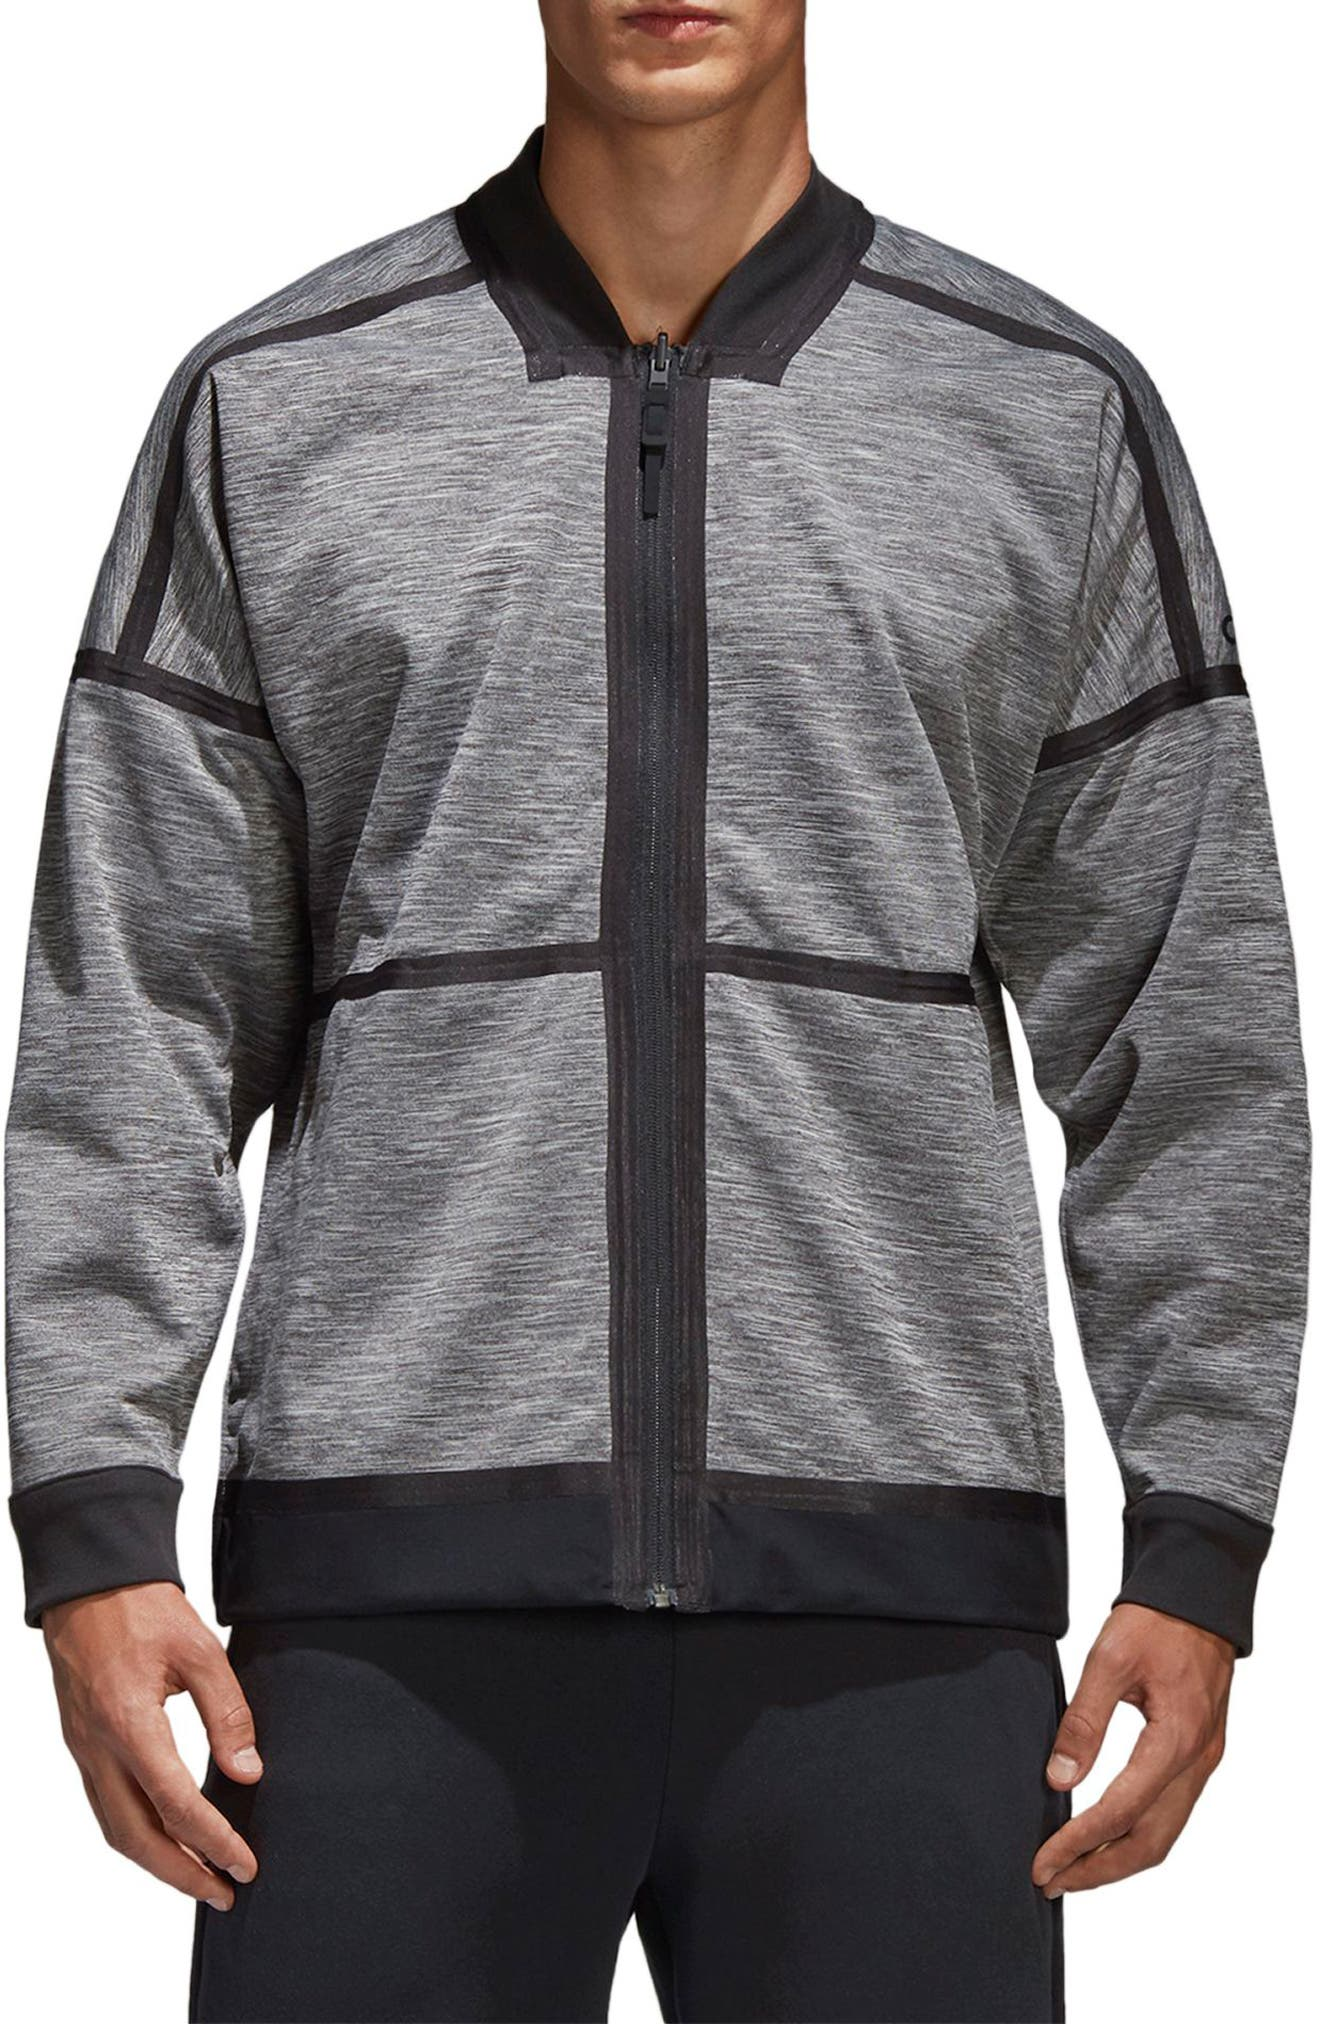 adidas Z.N.E. Reversible Ventilated Jacket